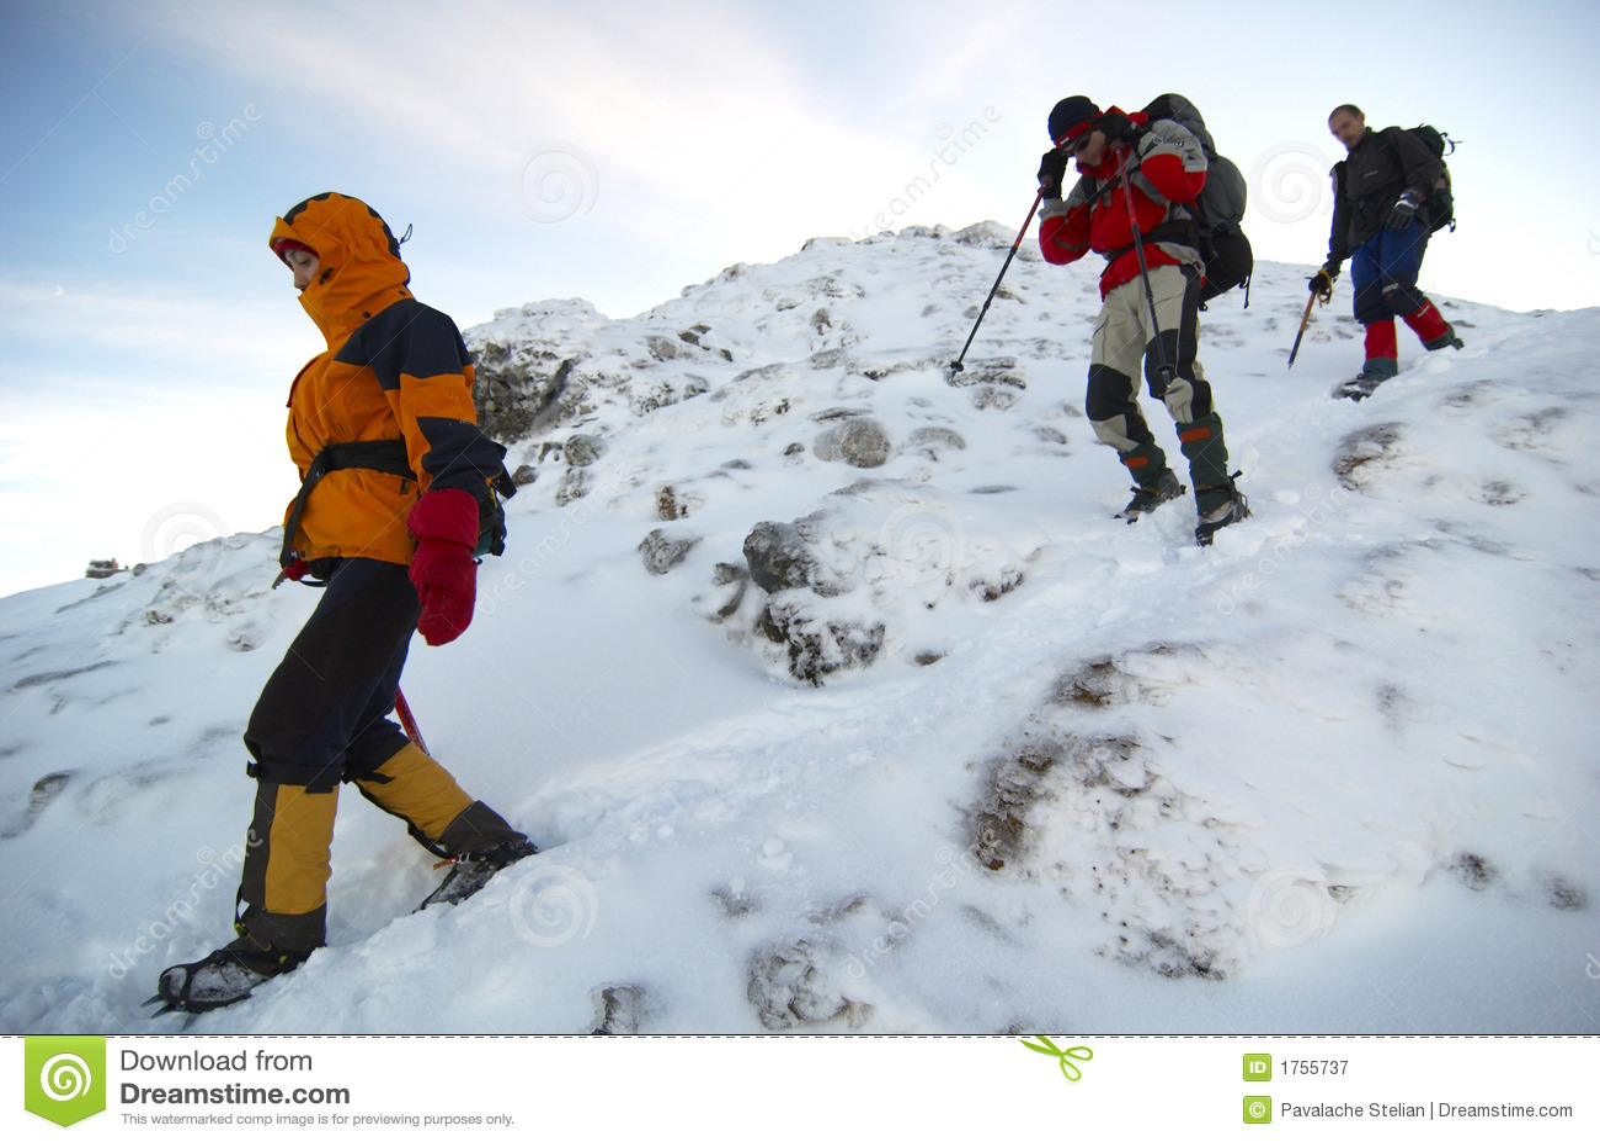 Mountain Climbers Descending The Mountain Royalty Free